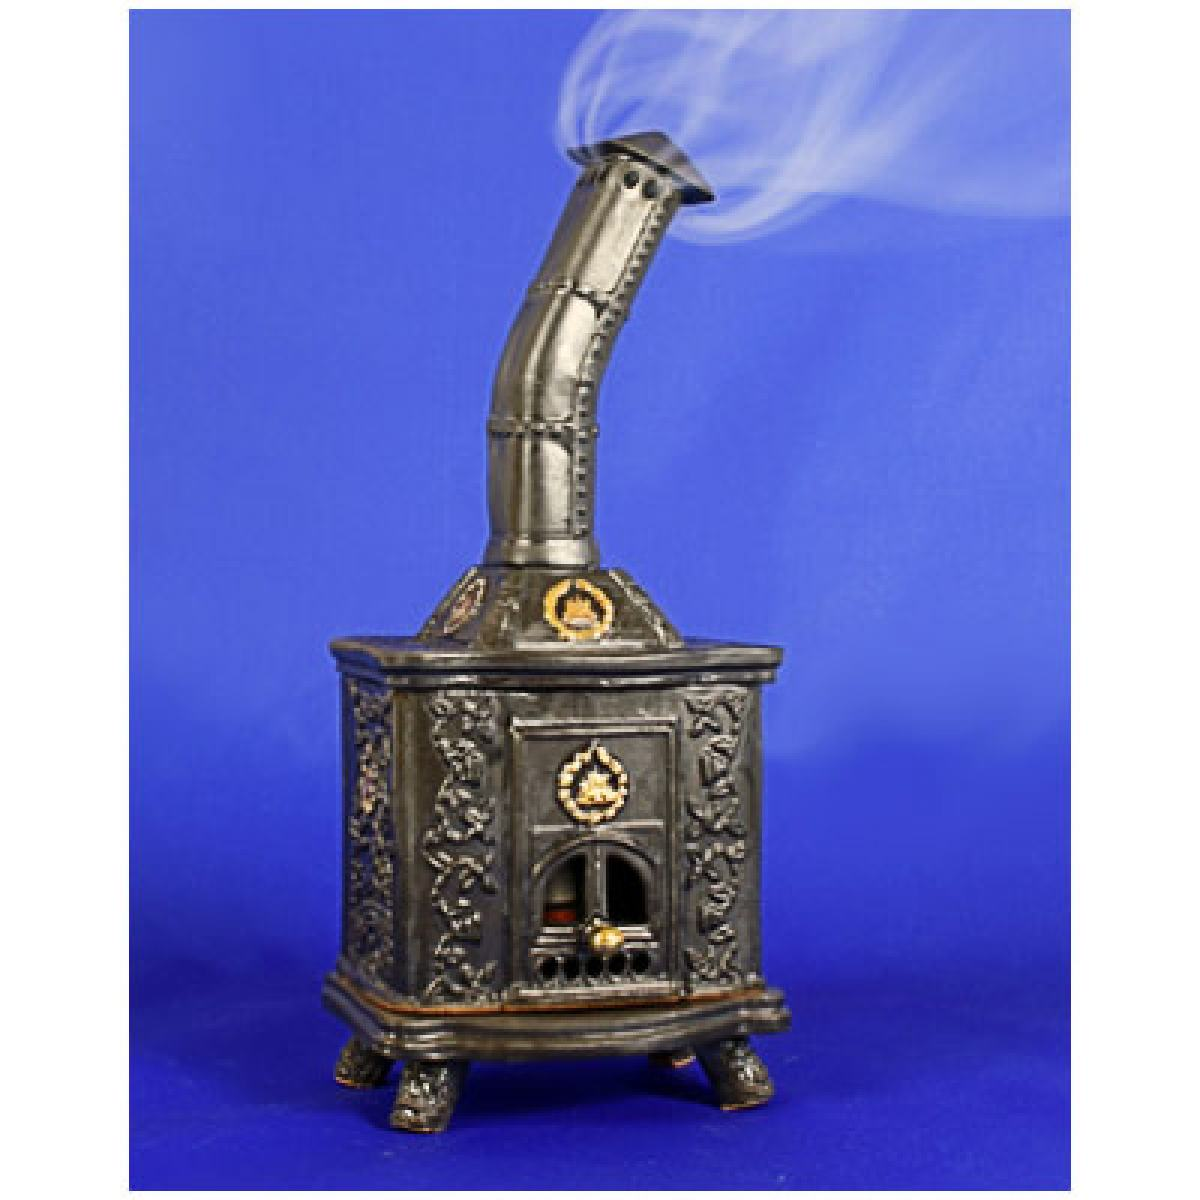 Ceramic stove incense burner SK32G Black 12 60€ Crafts Made in Lithuania